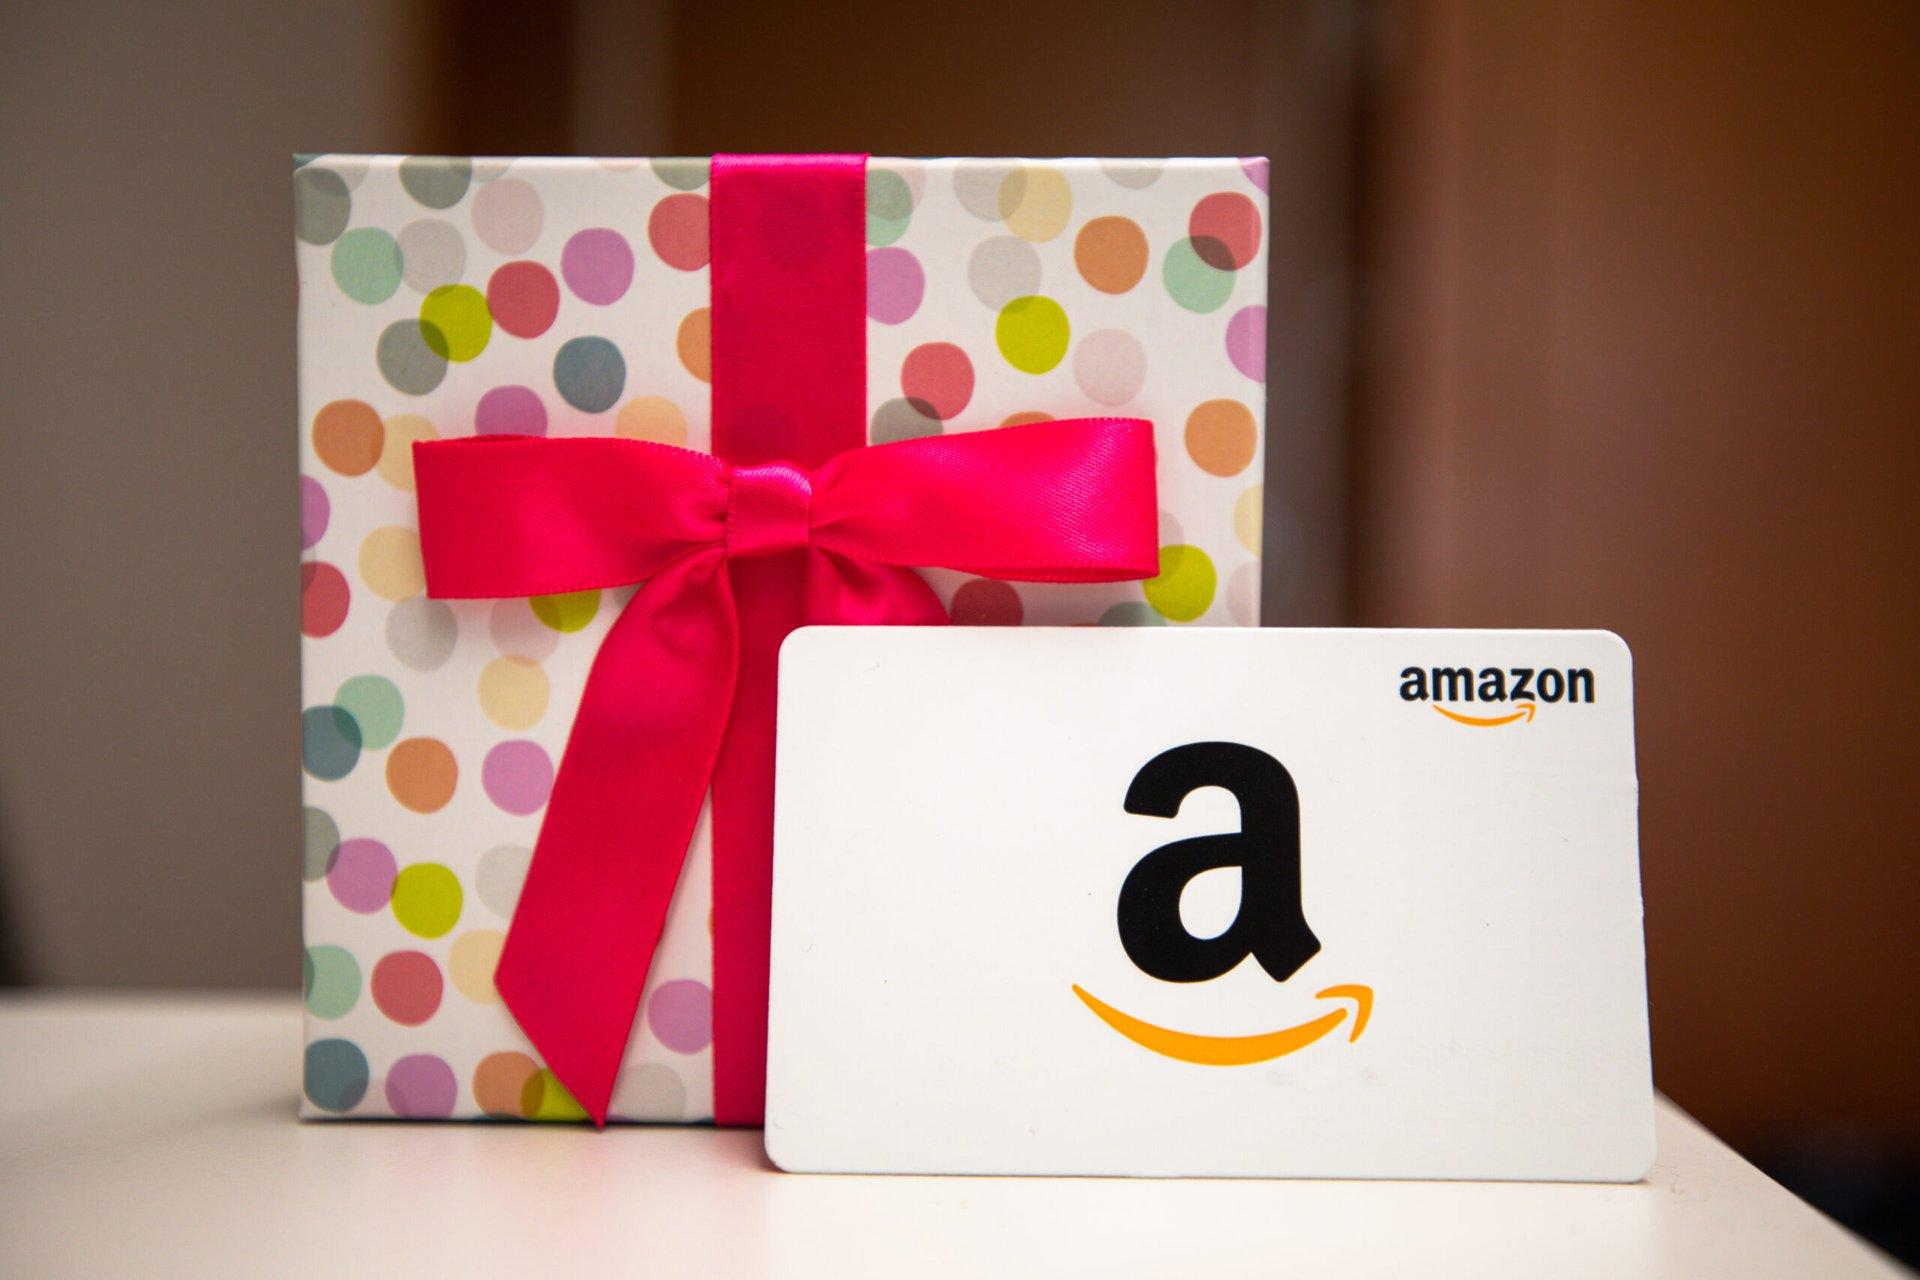 Amazon gift and gift card